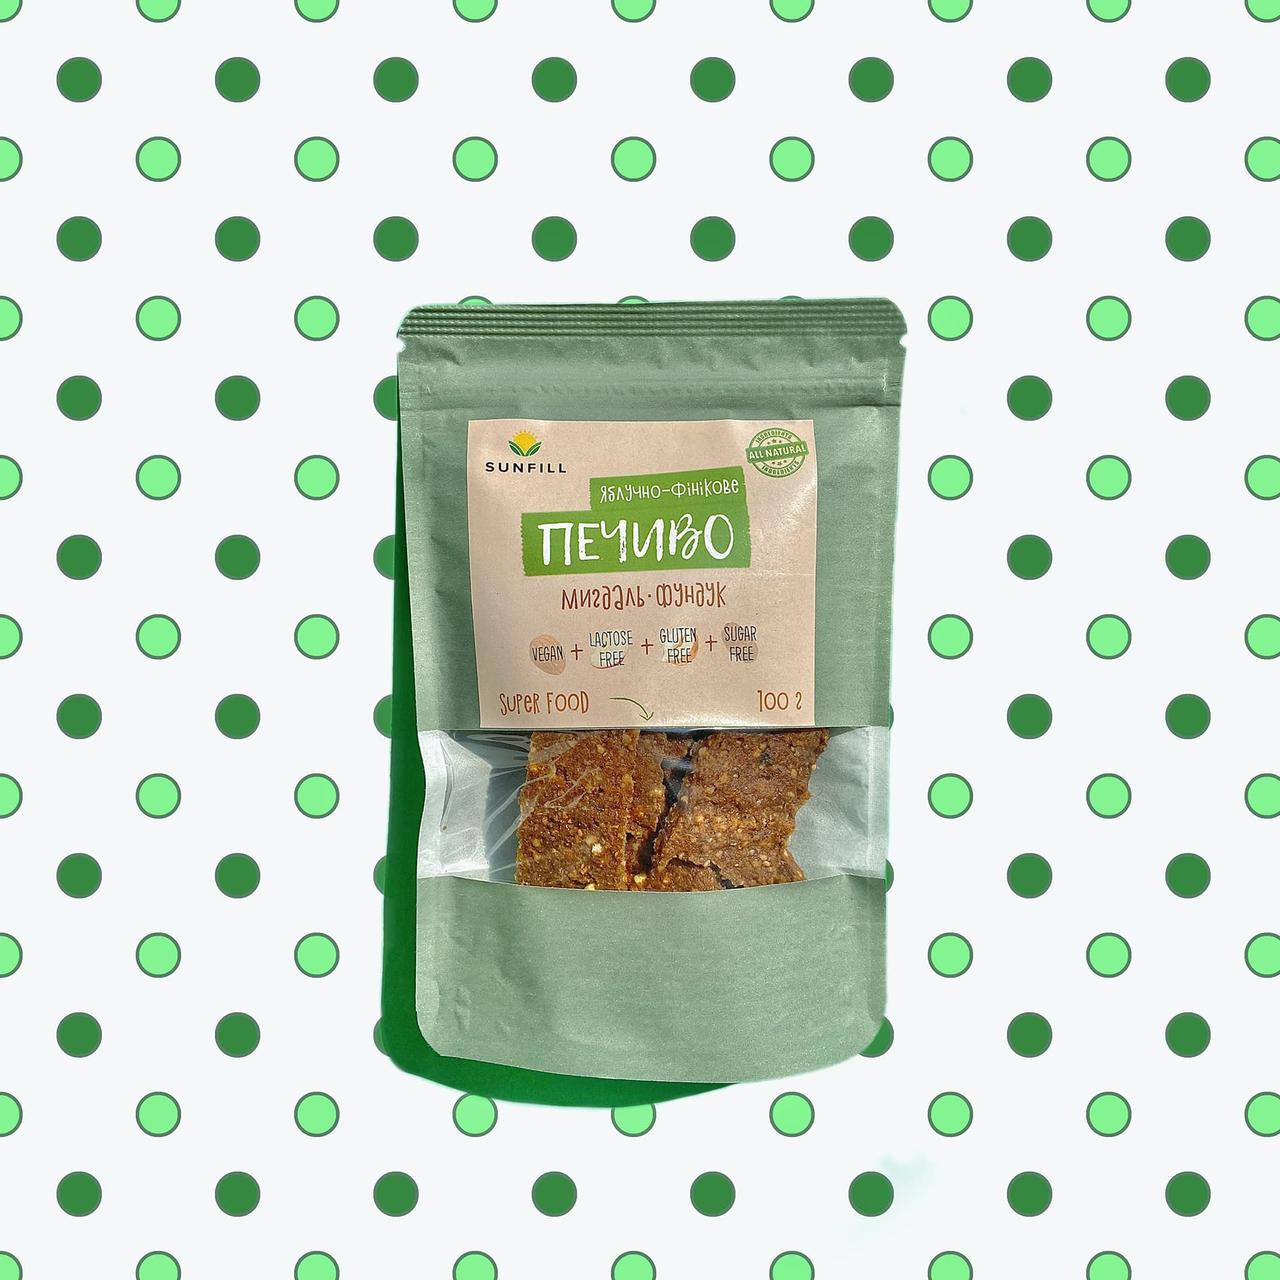 Натуральне яблучно-фінікове печиво з горіхами, без цукру, Sunfill 100 г